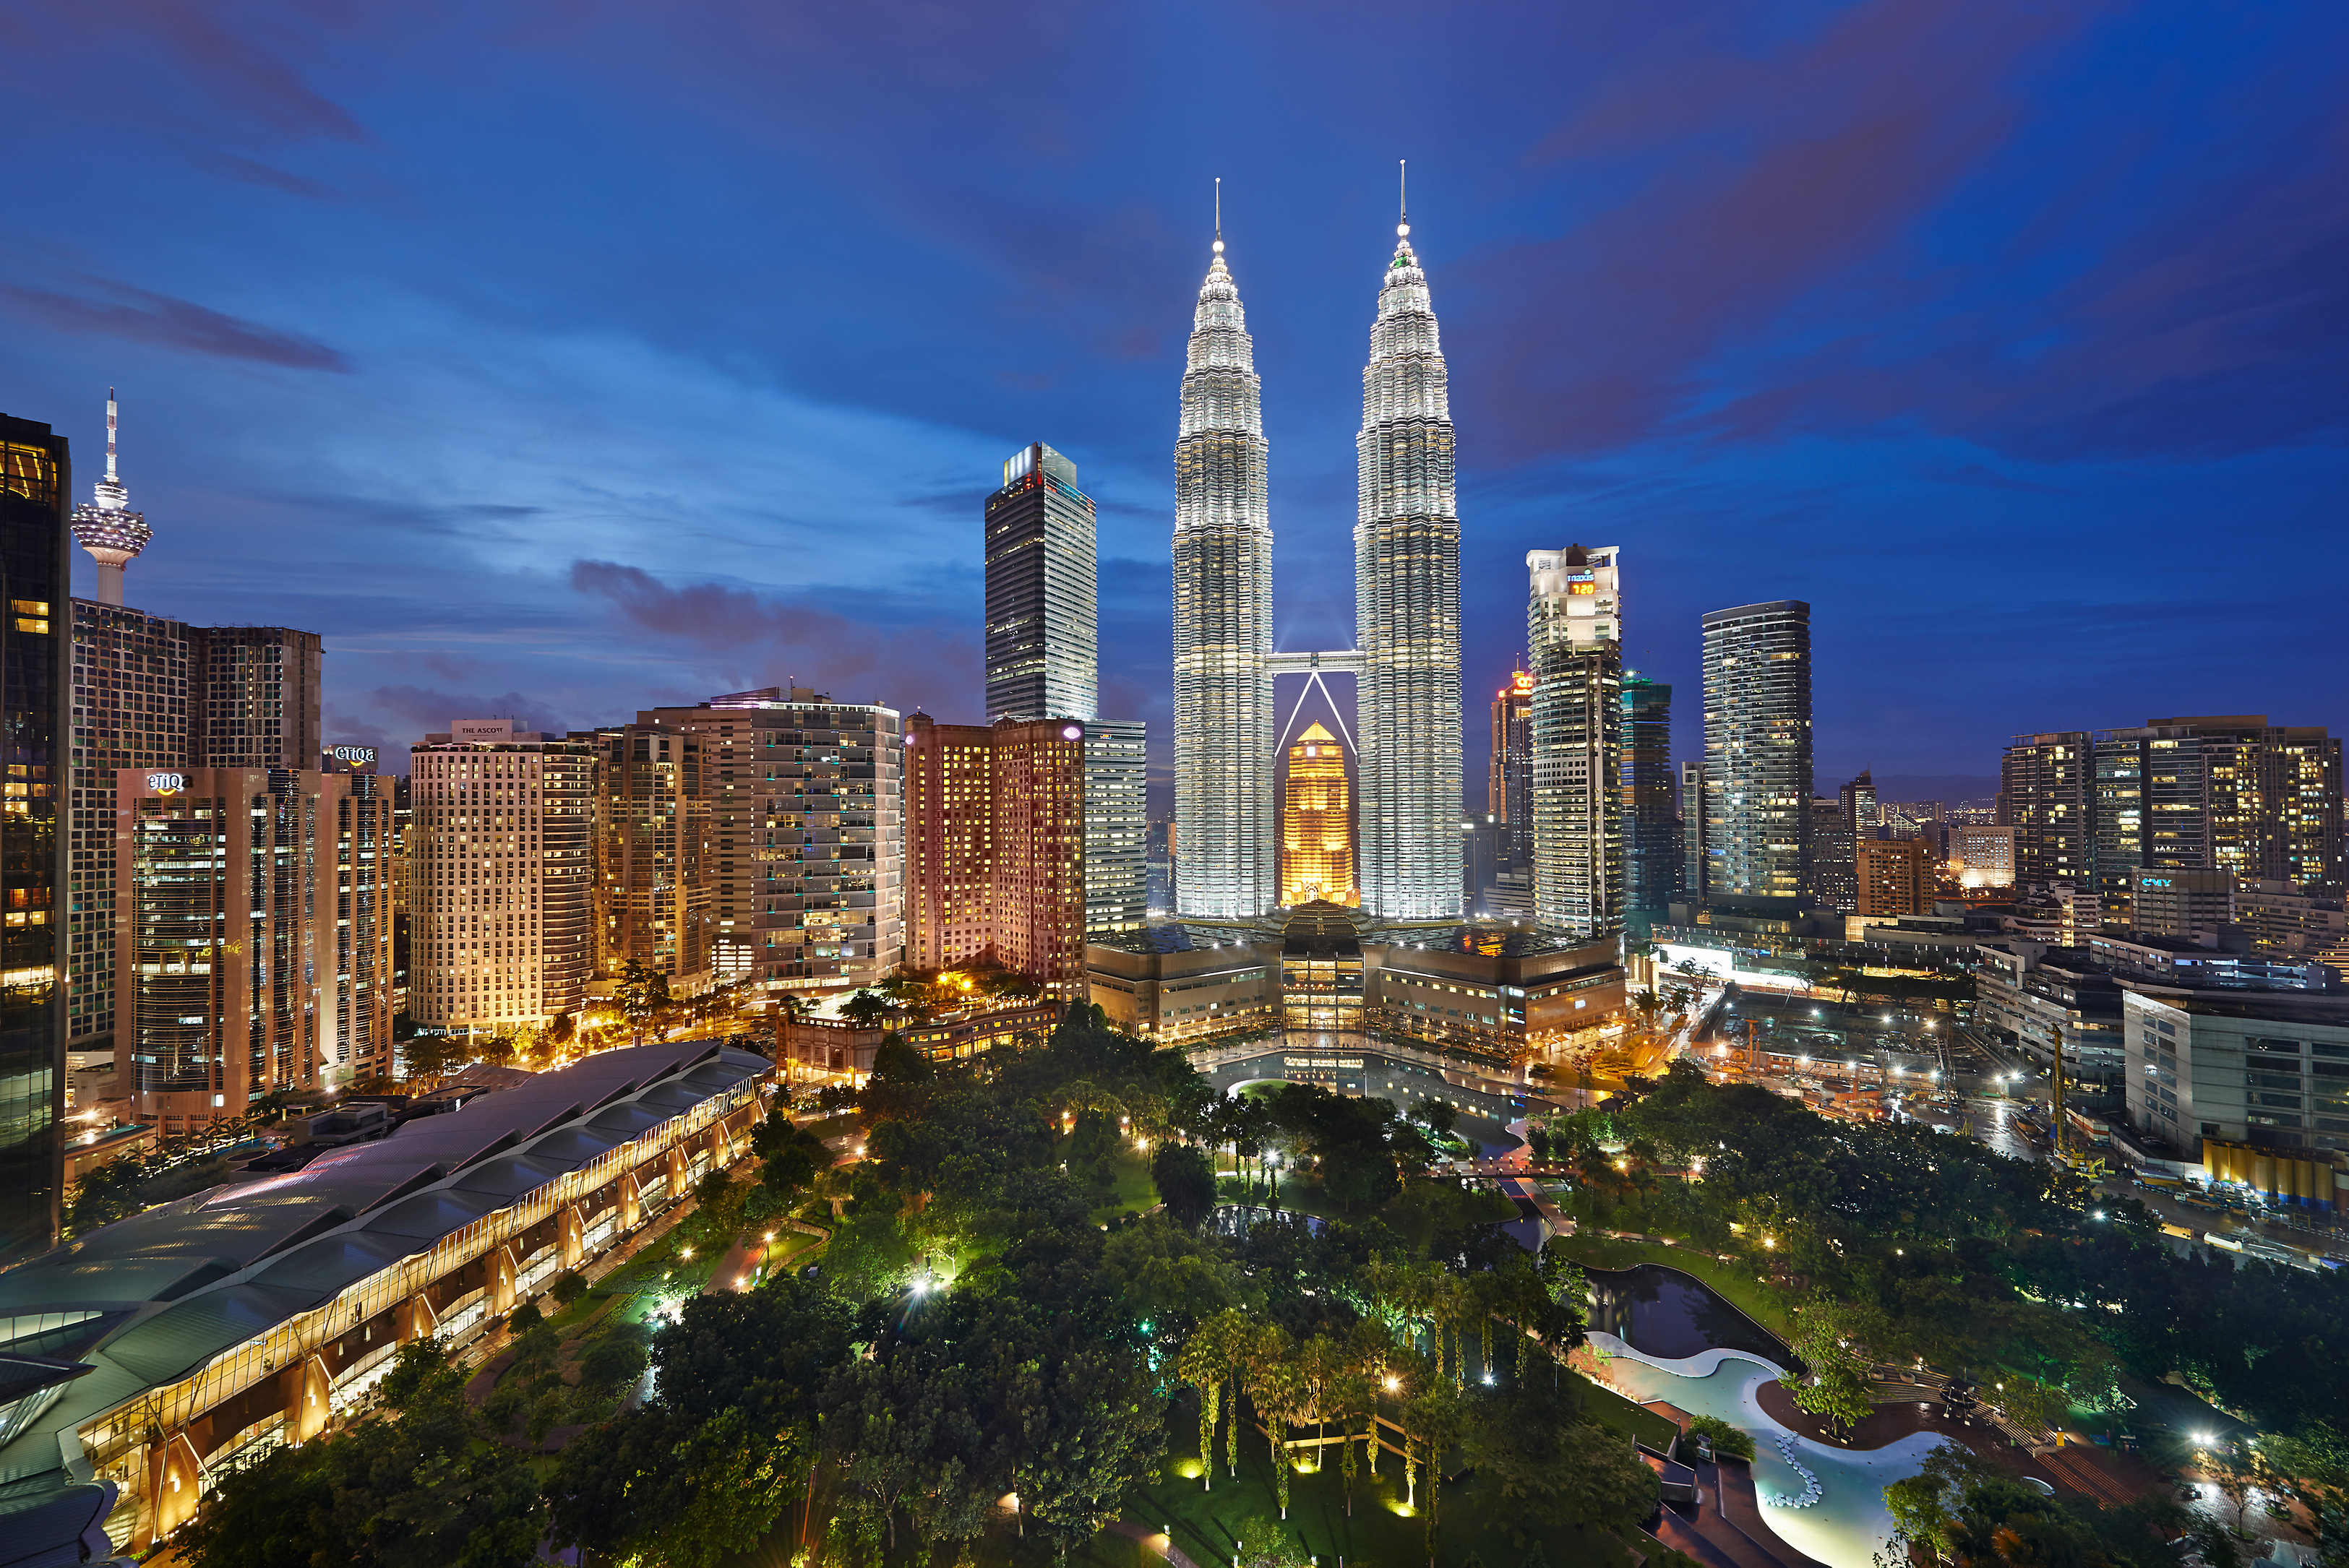 Iphone wallpaper koala - Kuala Lumpur Wallpapers Pictures Images